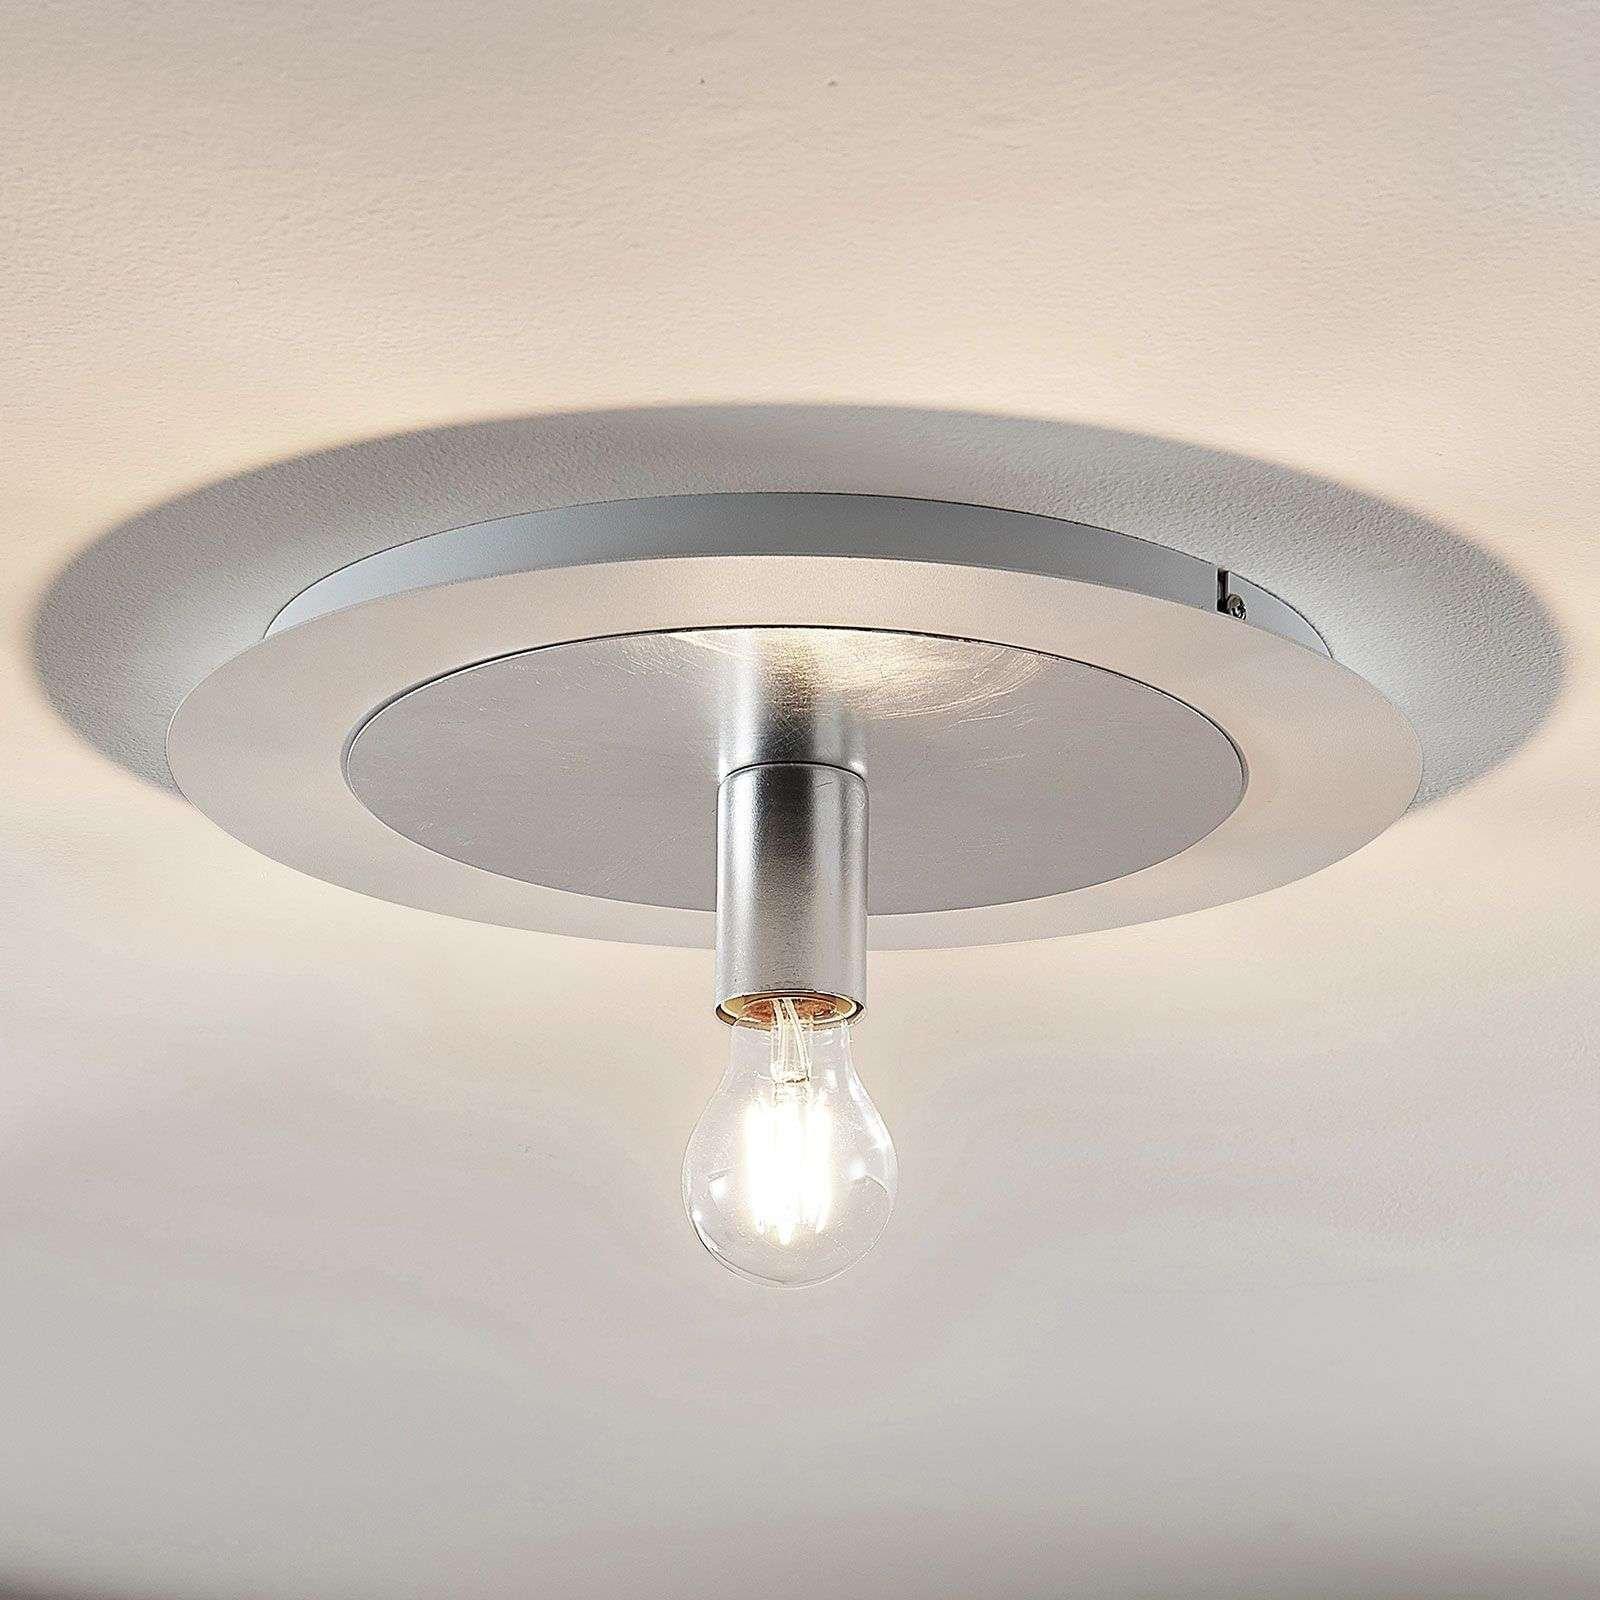 Justik metal ceiling light  1 bulb  white